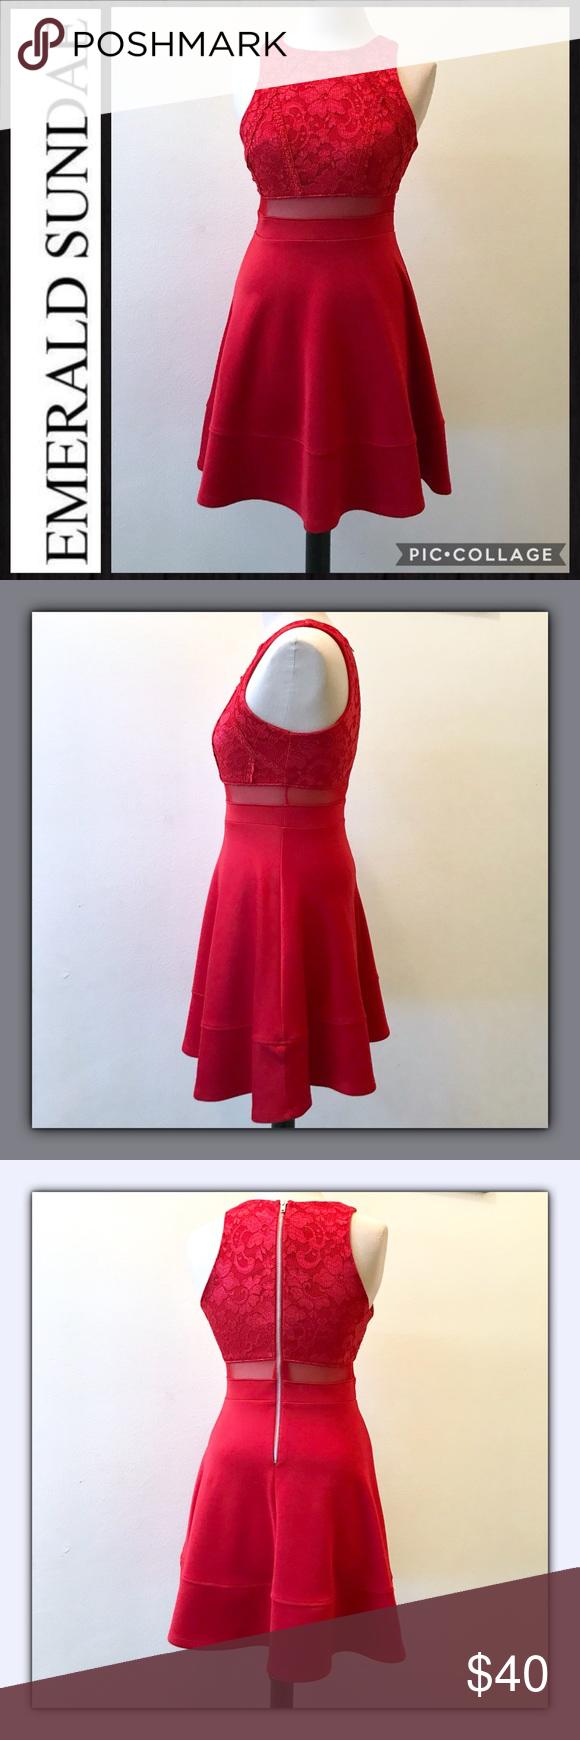 Emerald sundae red party dress pinterest